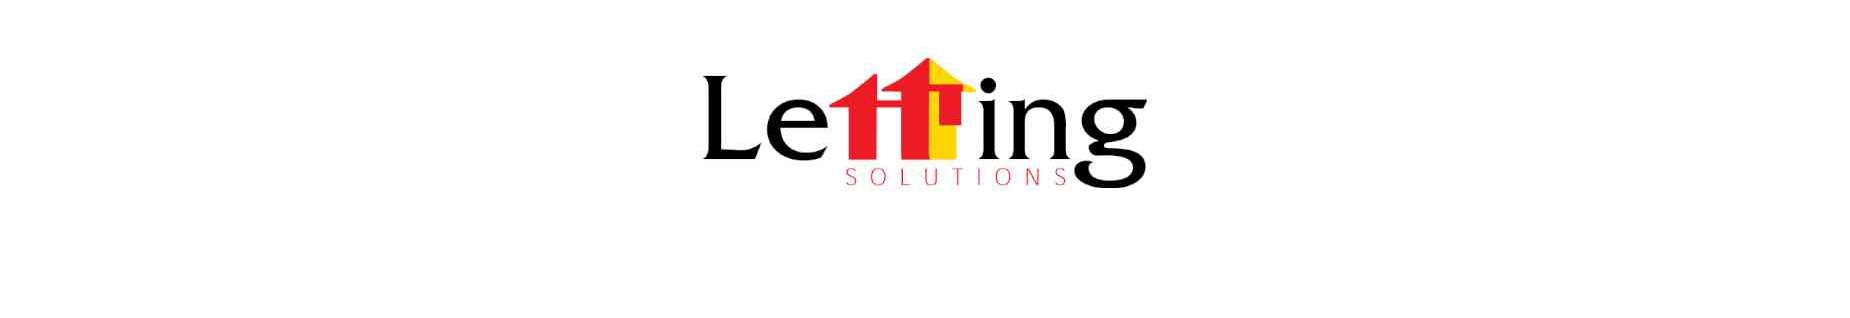 Letting Solutions Ltd | Livingston United Kingdom | 360 3D VR tours